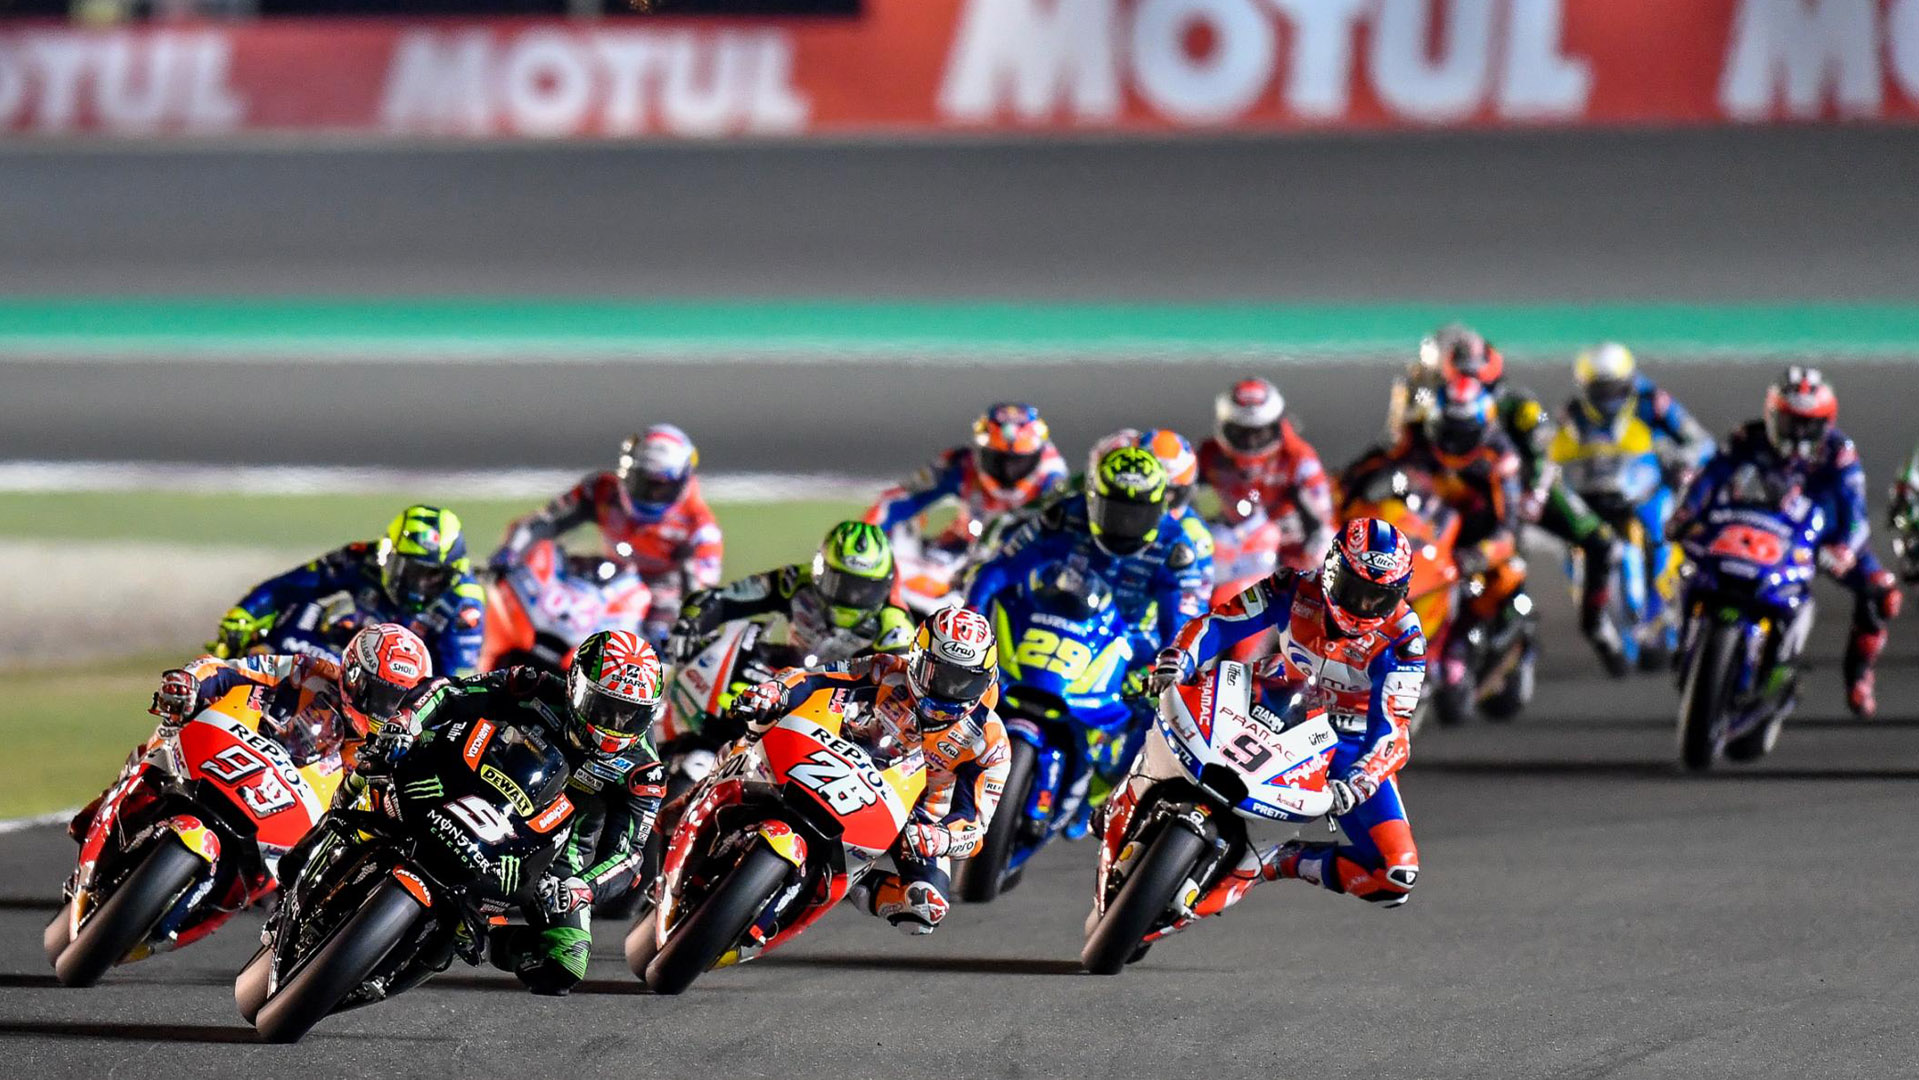 MotoGP Screening | Italian Grand Prix